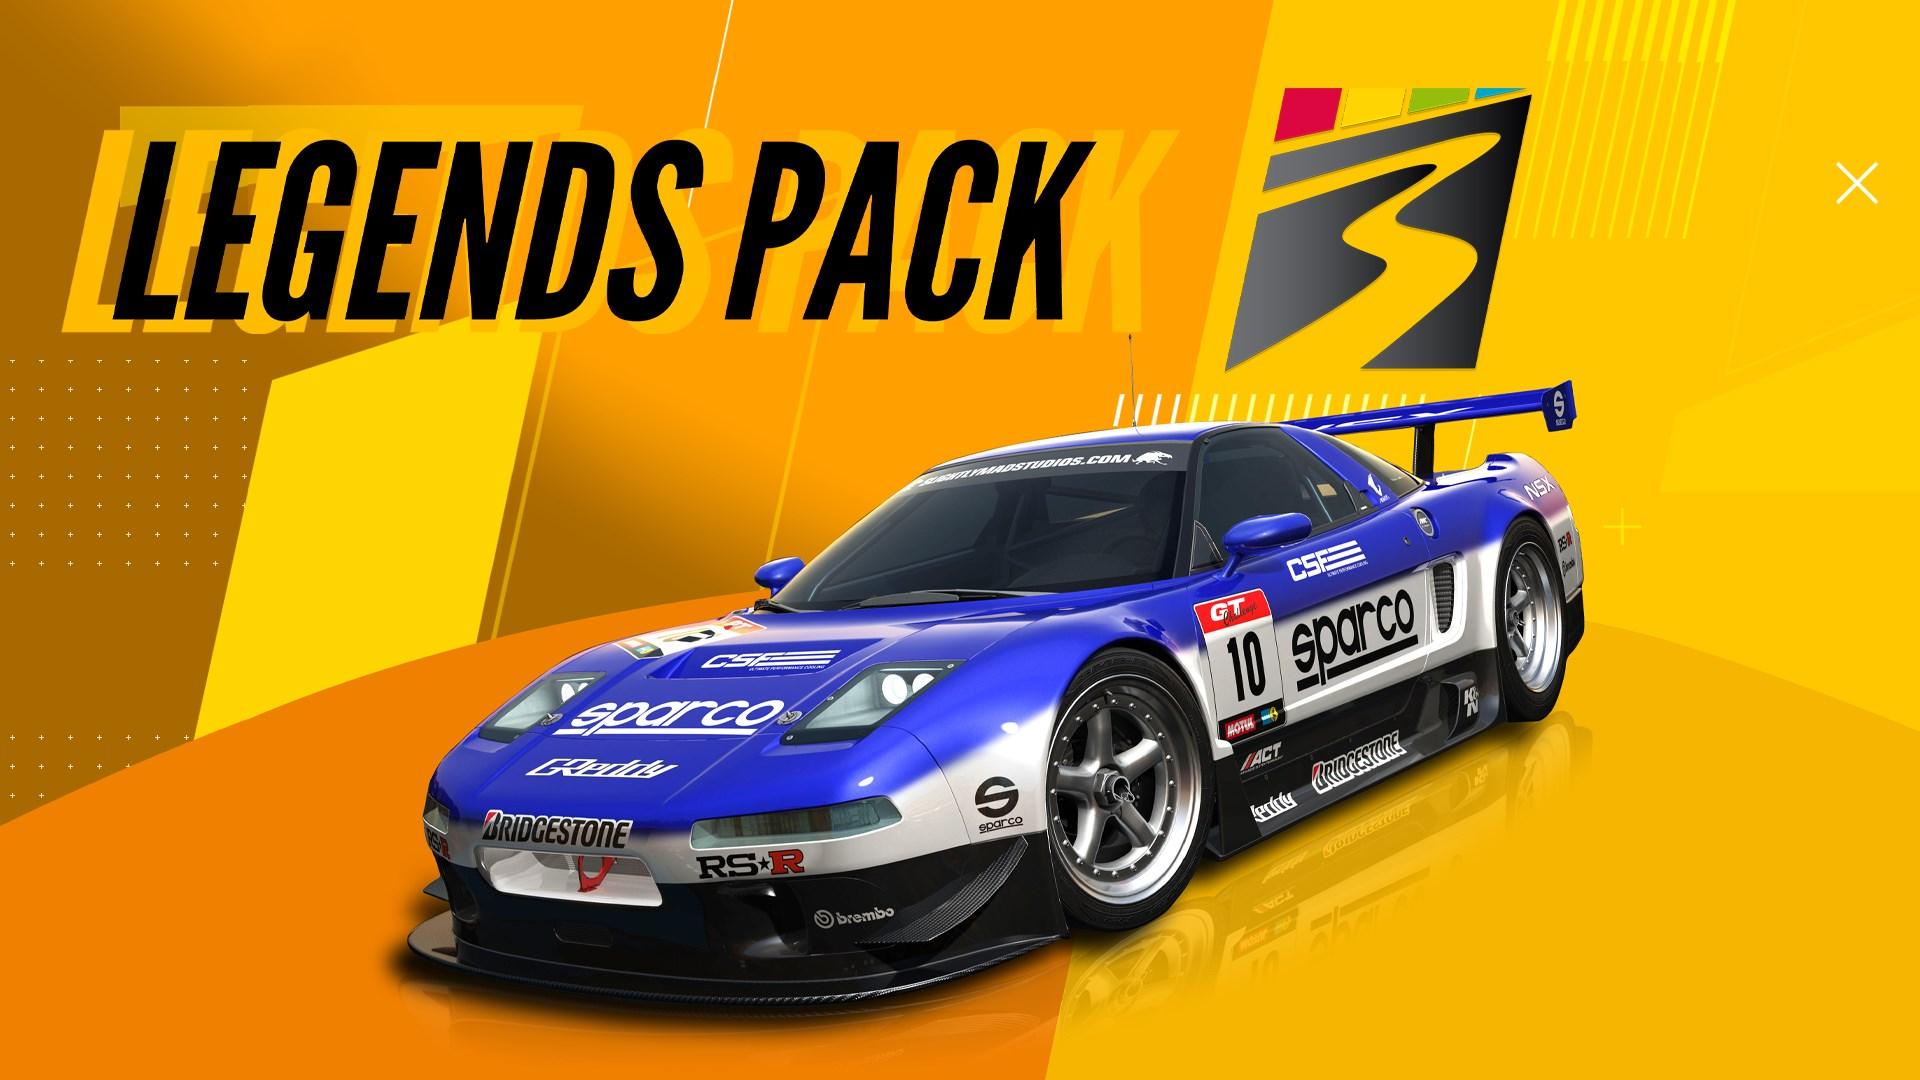 Project CARS 3: Legends Pack